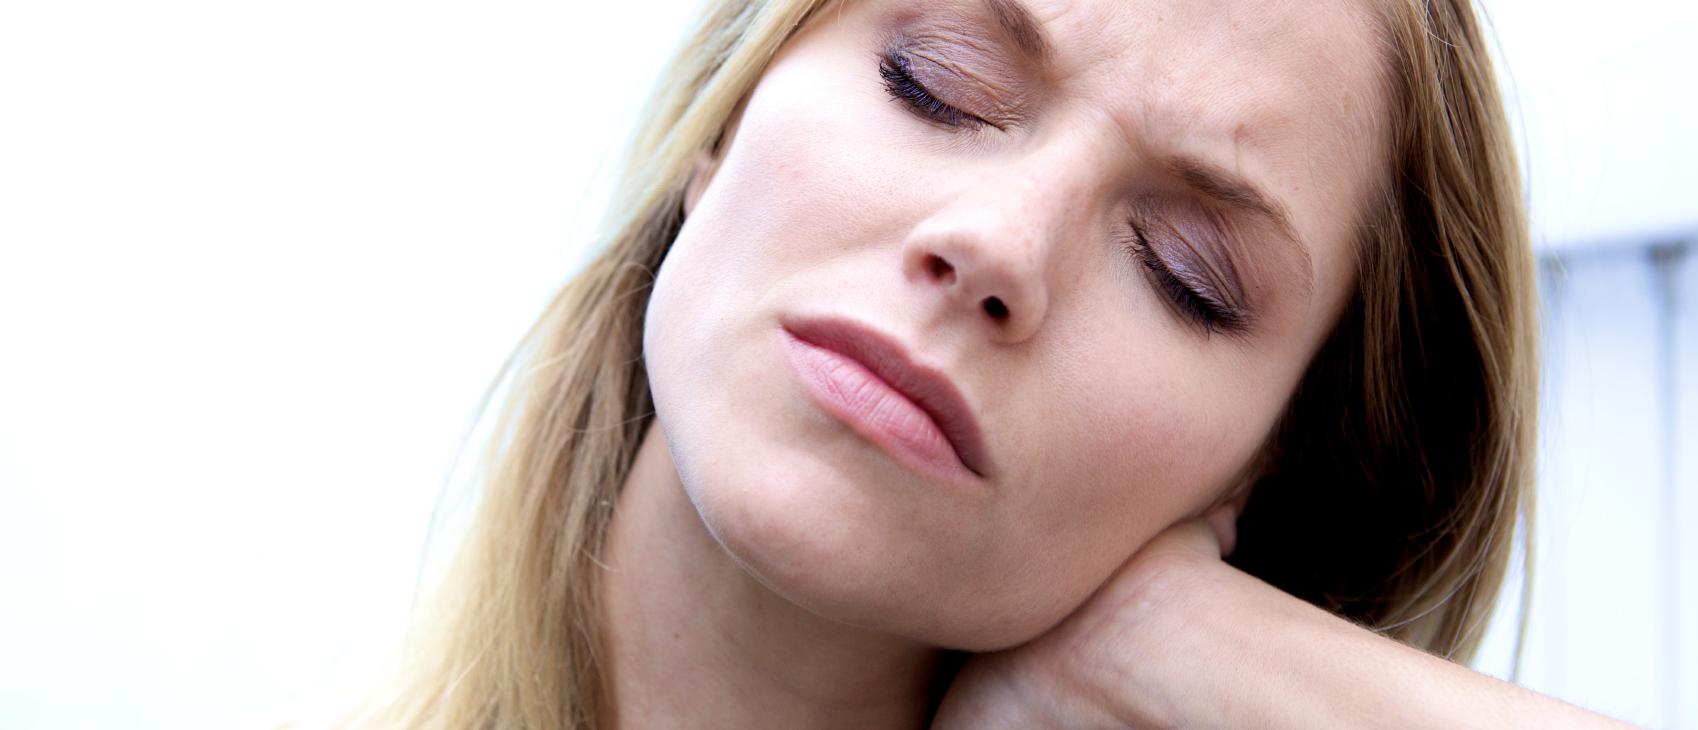 Hodepine stiv nakke og skuldre